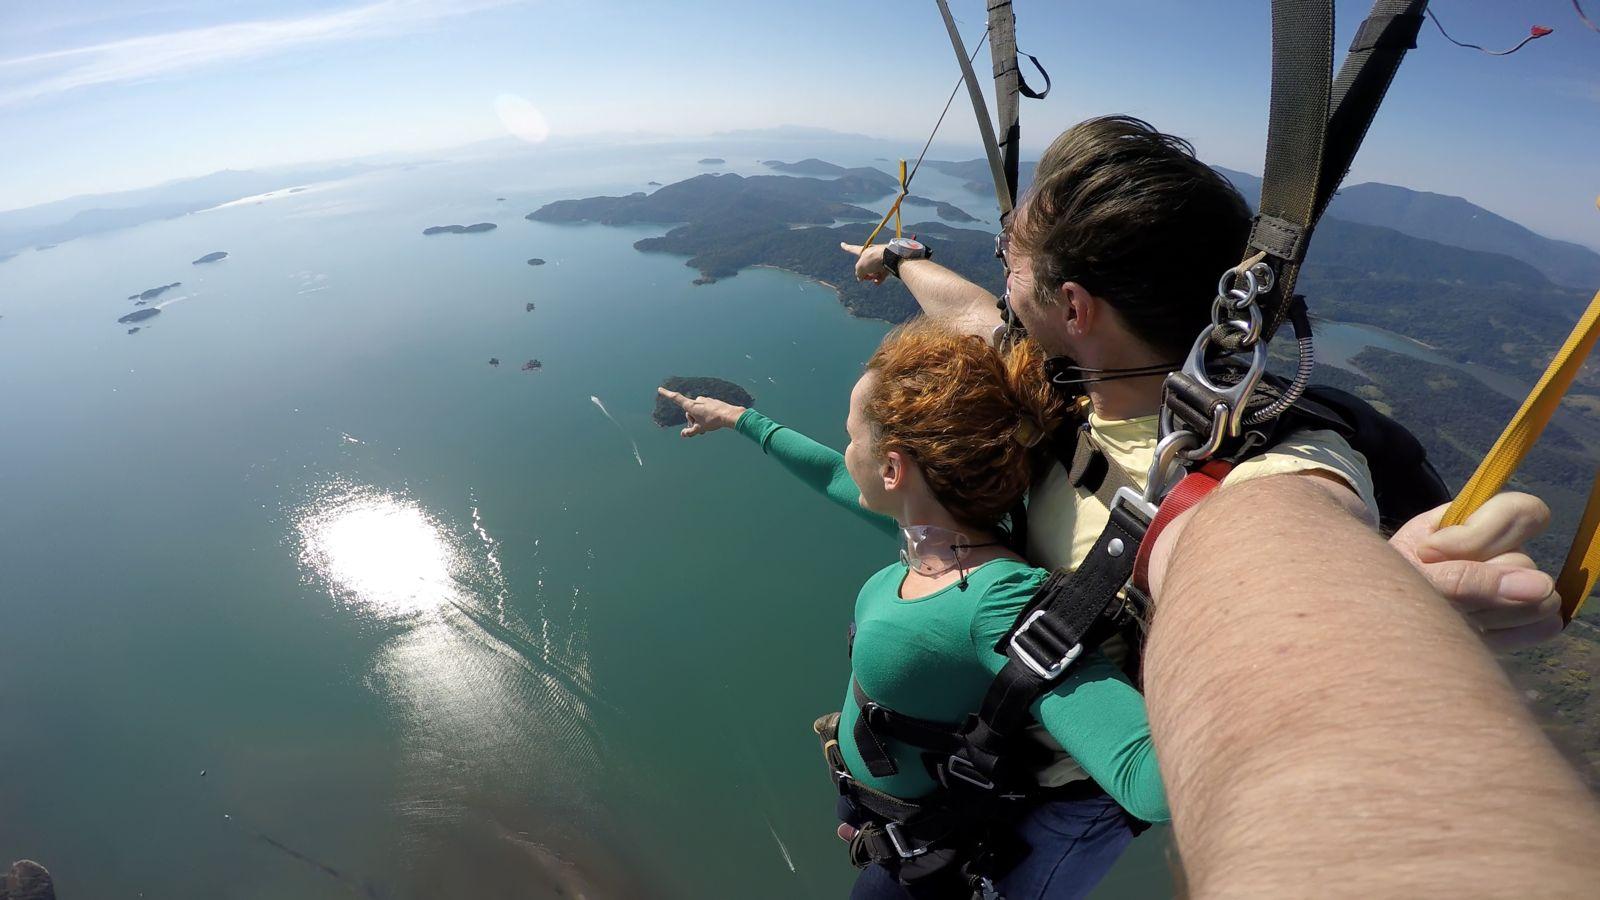 Skydivers taking a selfie